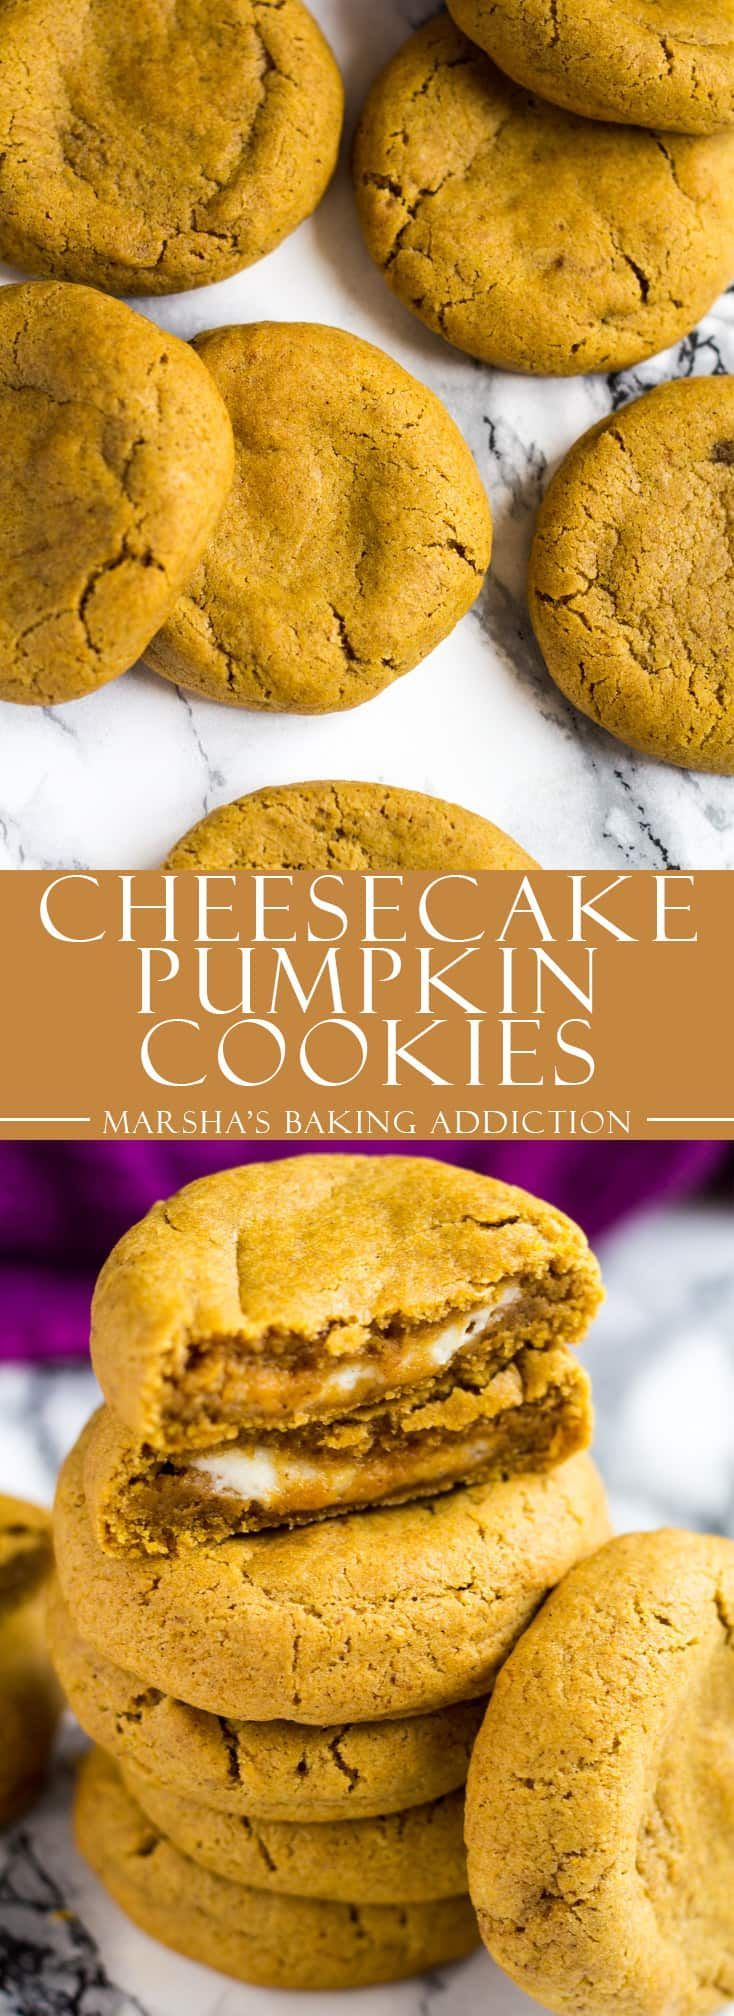 Cheesecake Stuffed Pumpkin Cookies | marshasbakingaddiction.com @marshasbakeblog